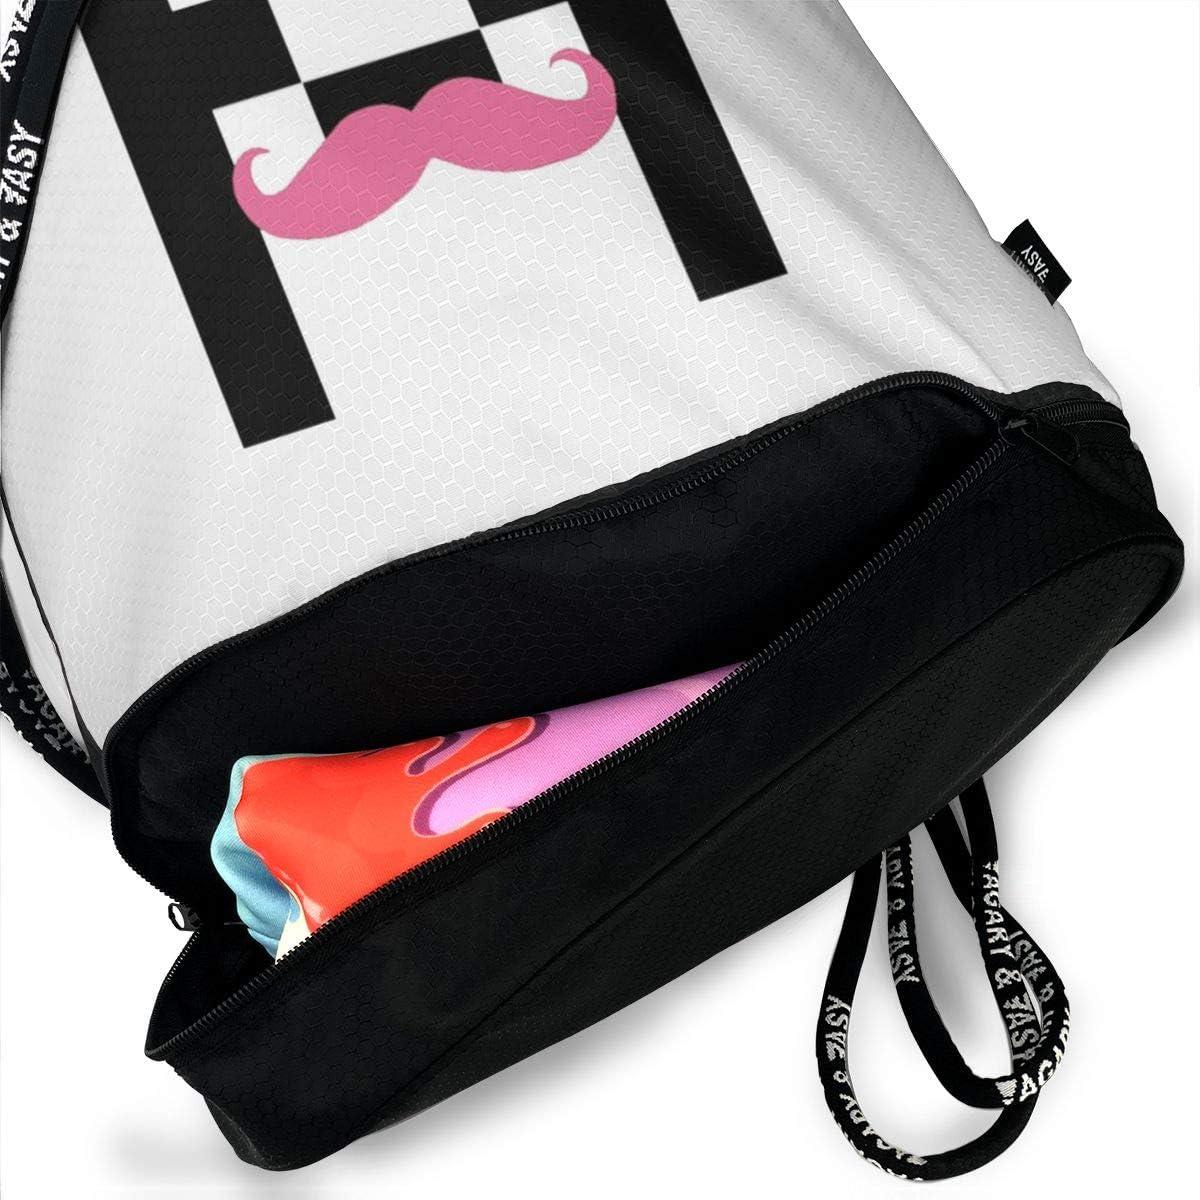 DIDhsswuz Markiplier Unisex Drawstring Backpack Drawstring Bag Bundle Backpack Yoga Bag